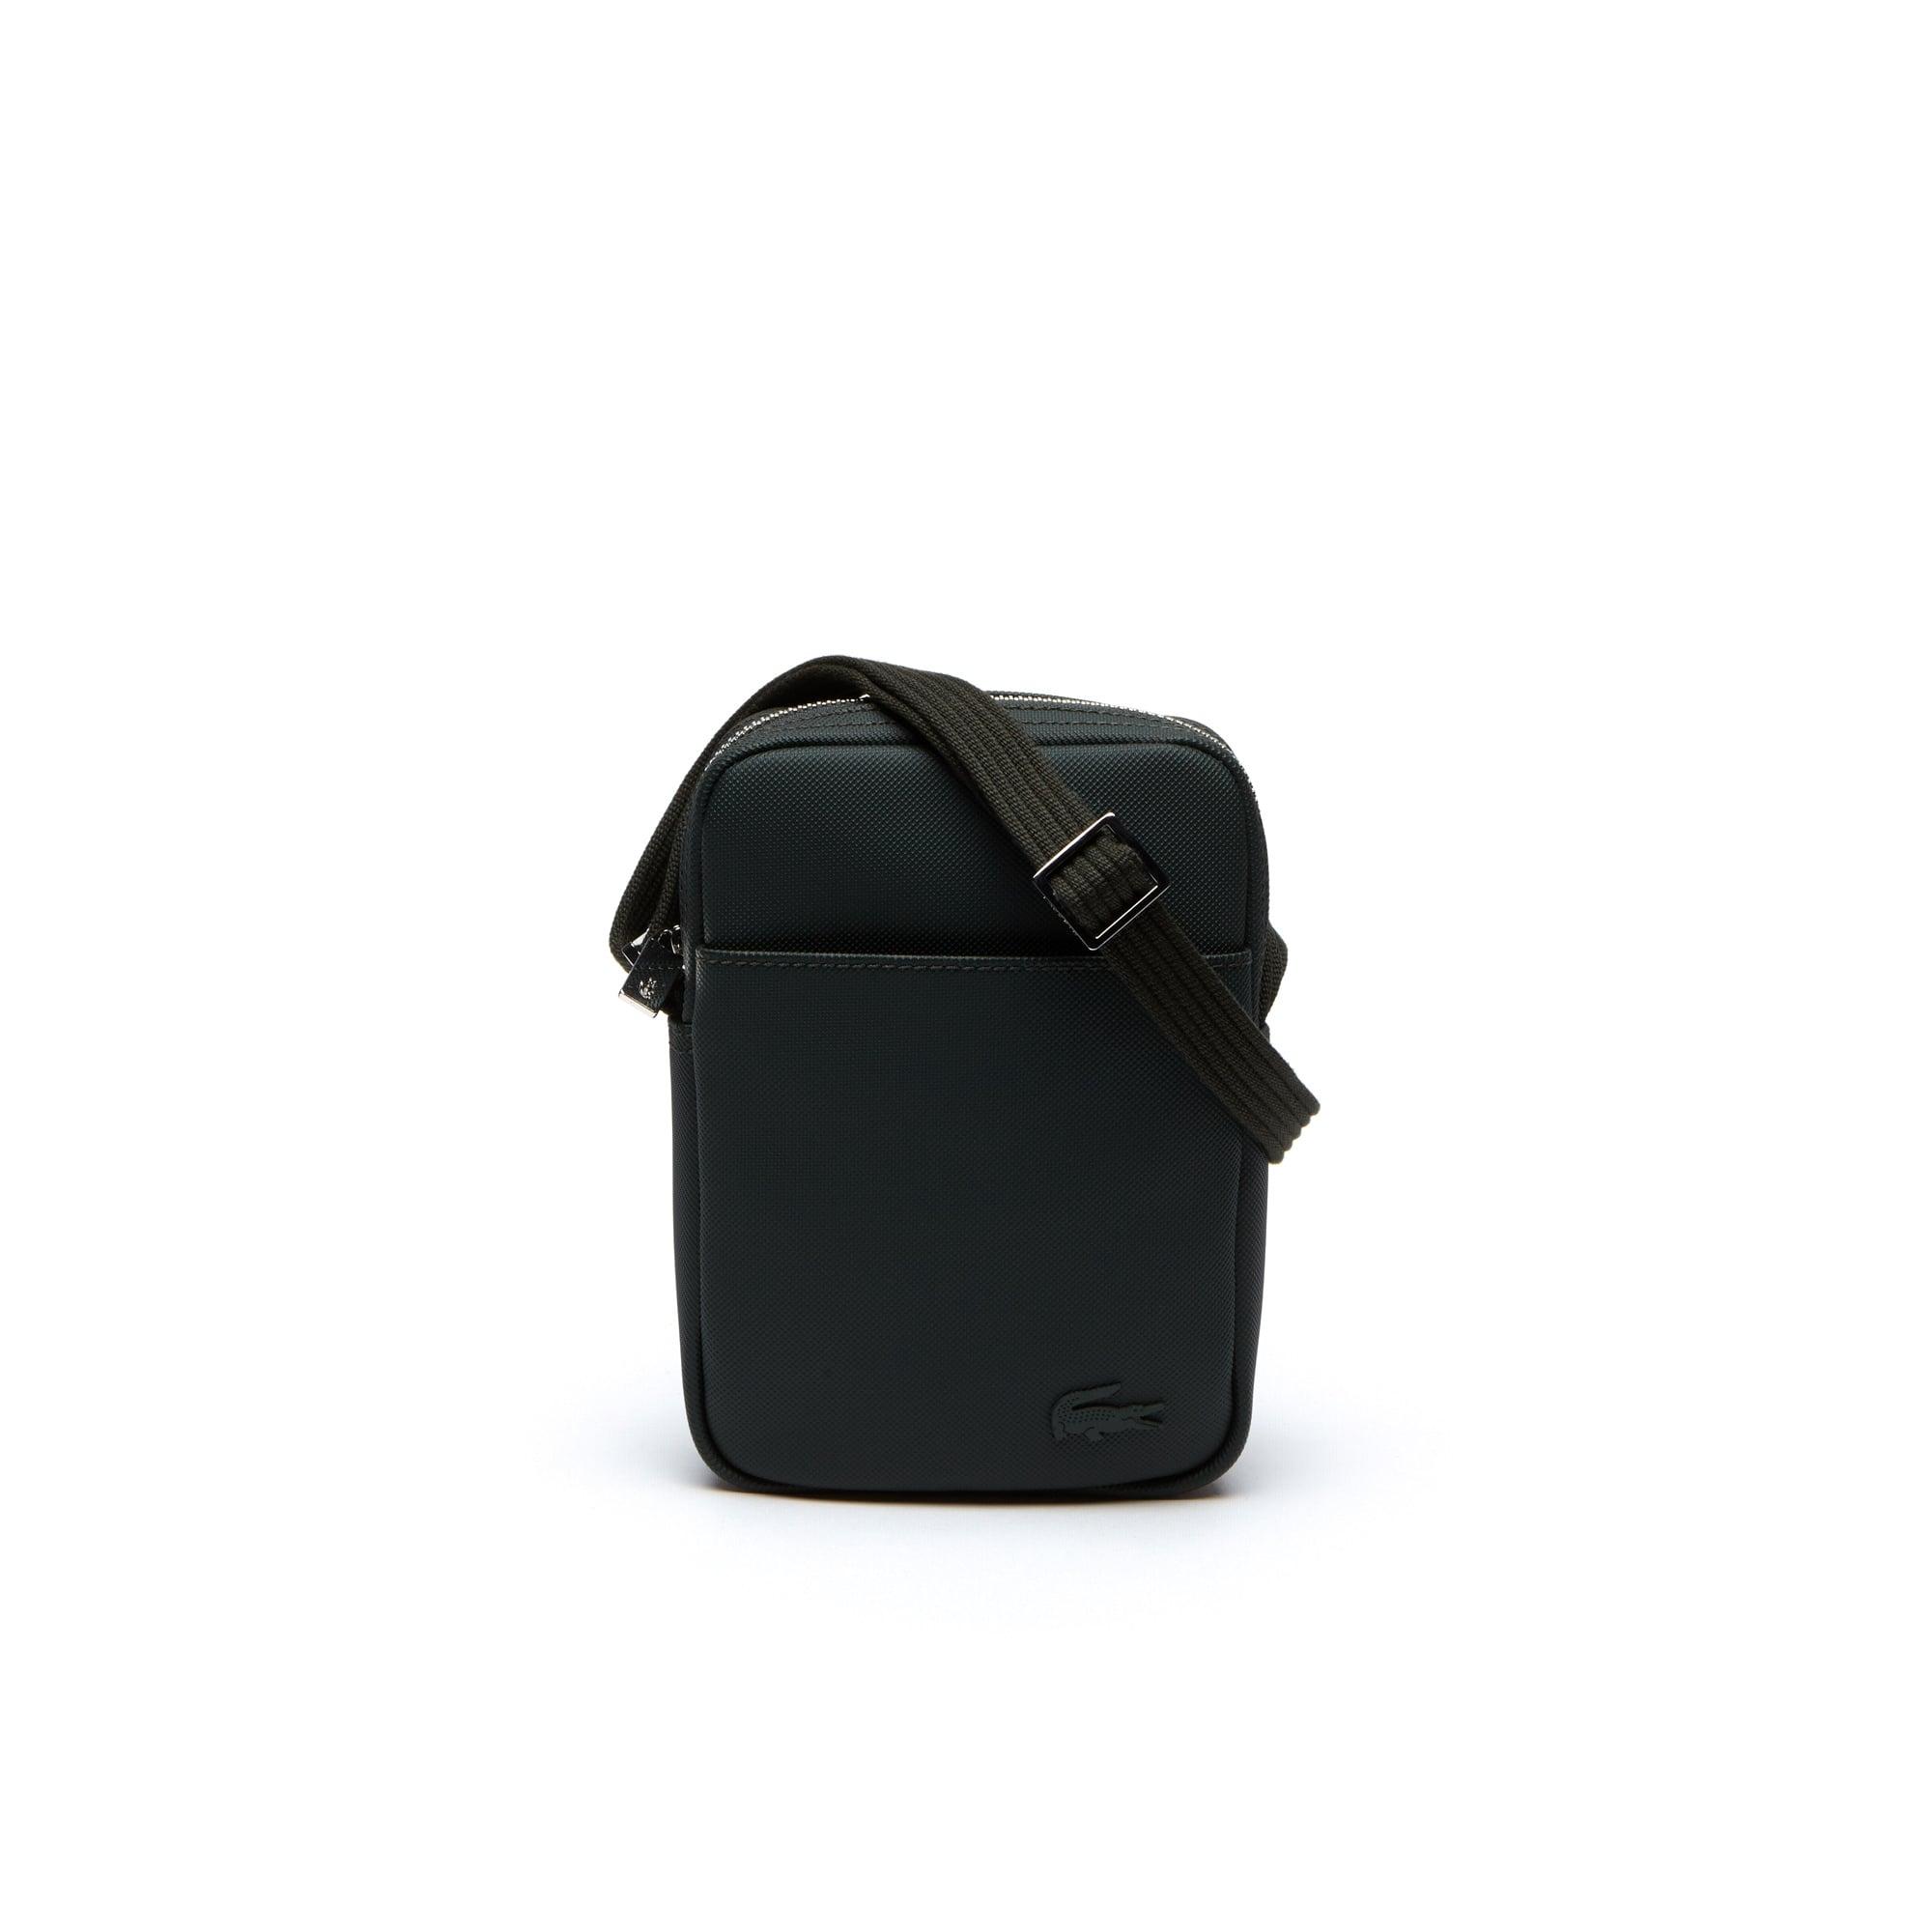 Vertikale Herren-Tasche CLASSIC aus Petit Piqué